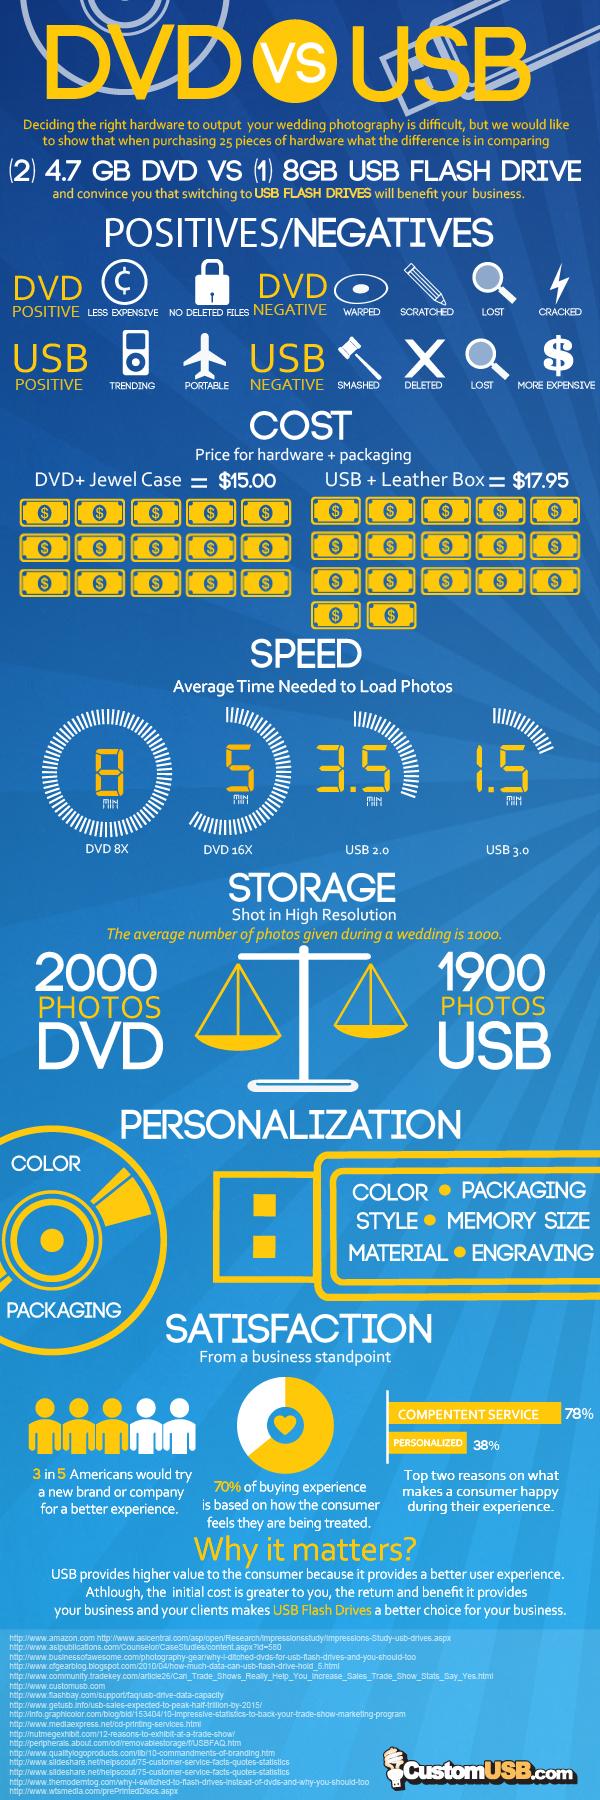 Custom_USB_DVD_vs_USB_Infographic